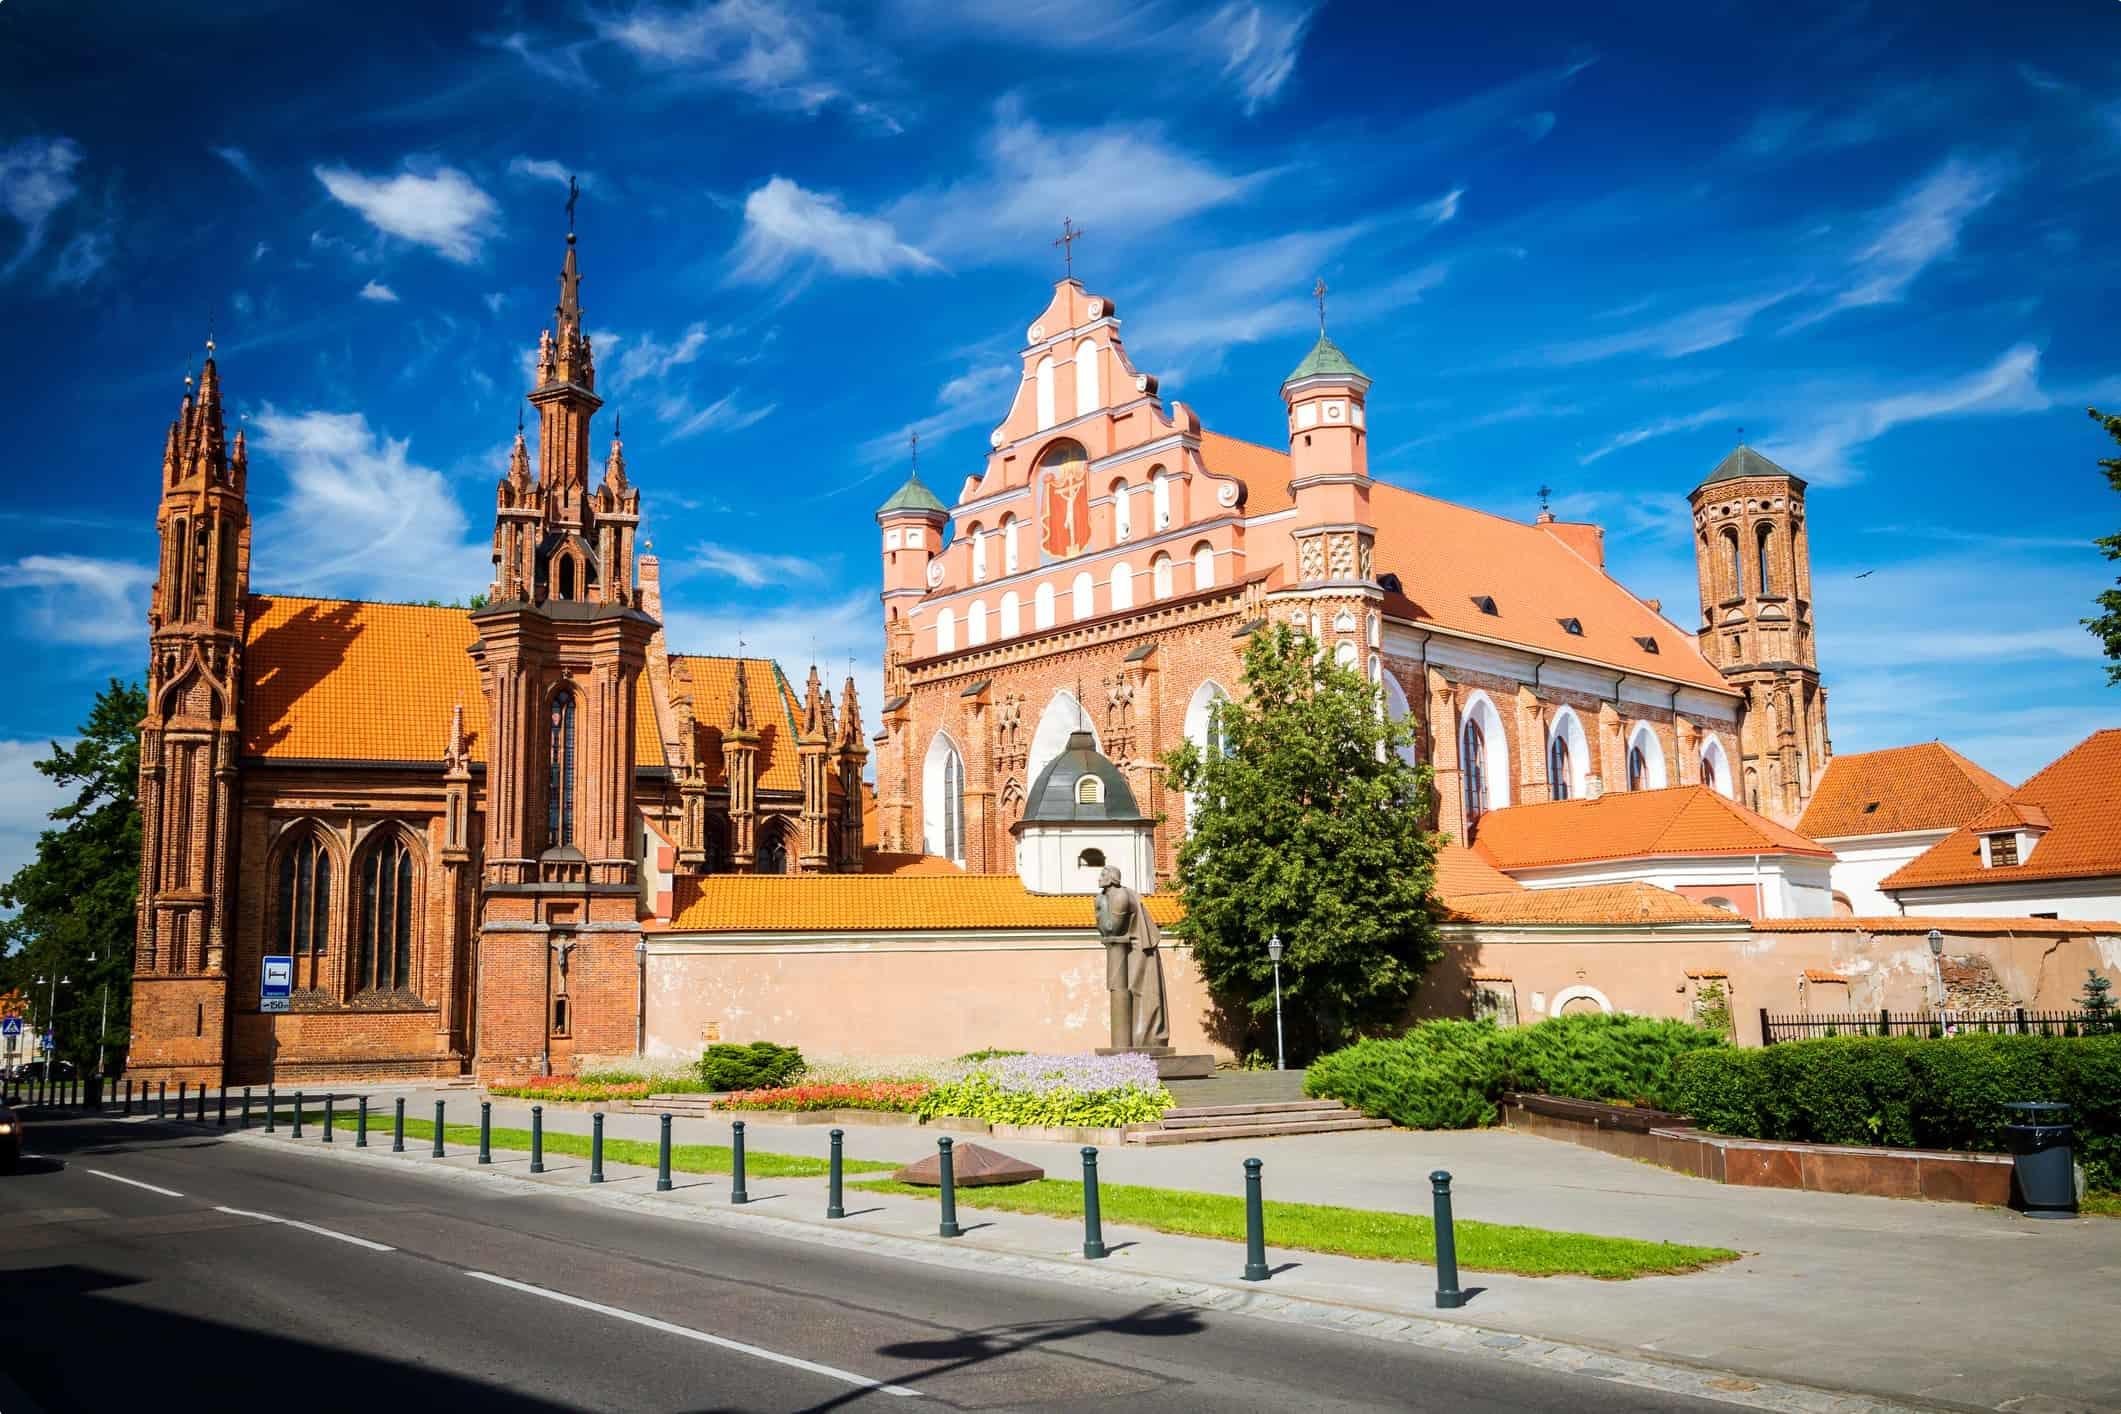 St. Anne's Church, Vilnius, Lithuania